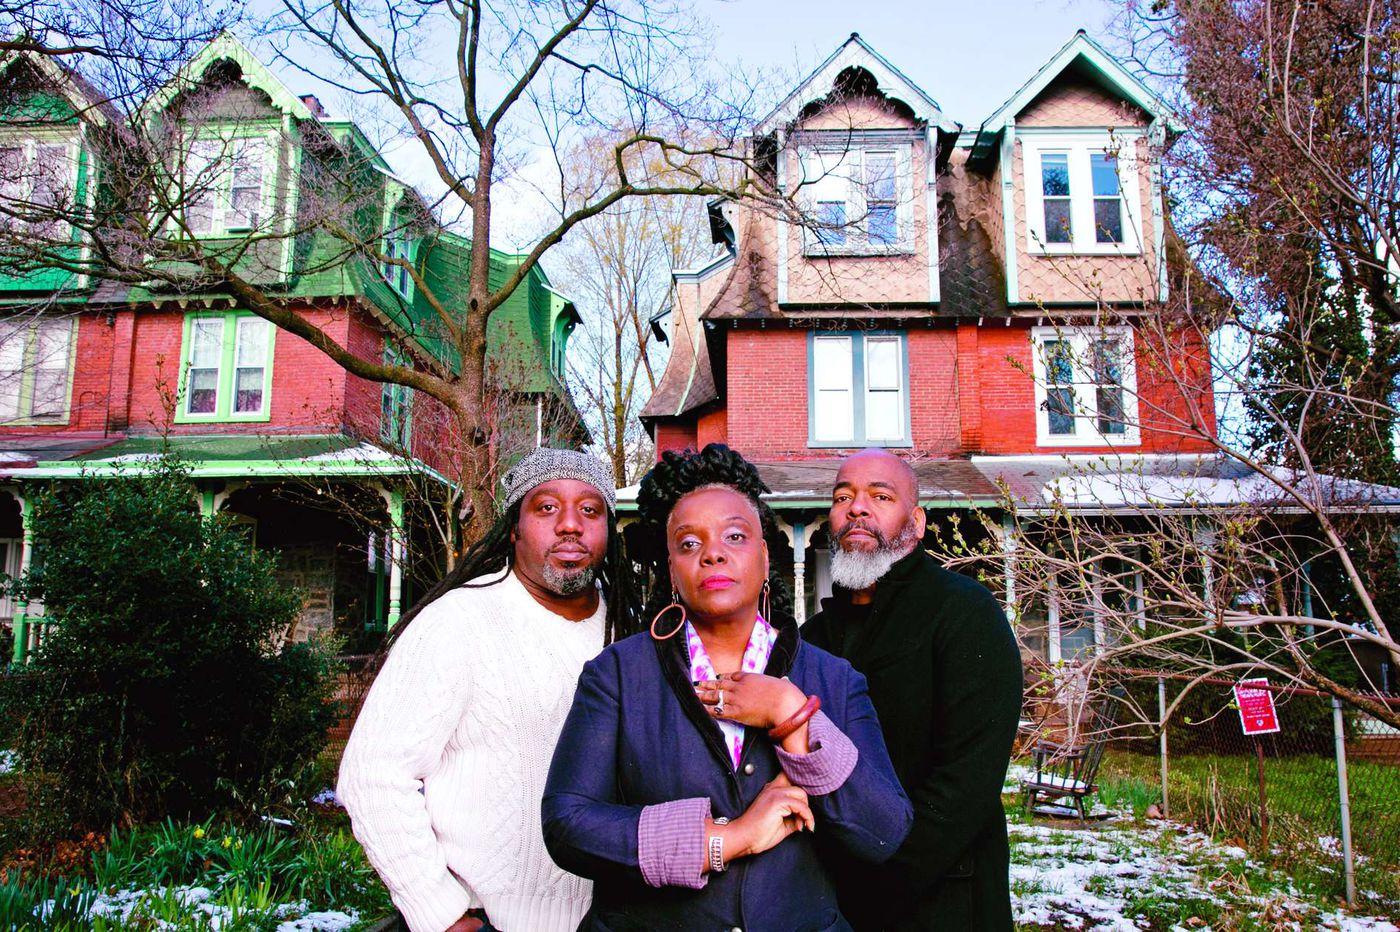 Let's talk about the Philadelphia monuments we need to preserve | Inga Saffron